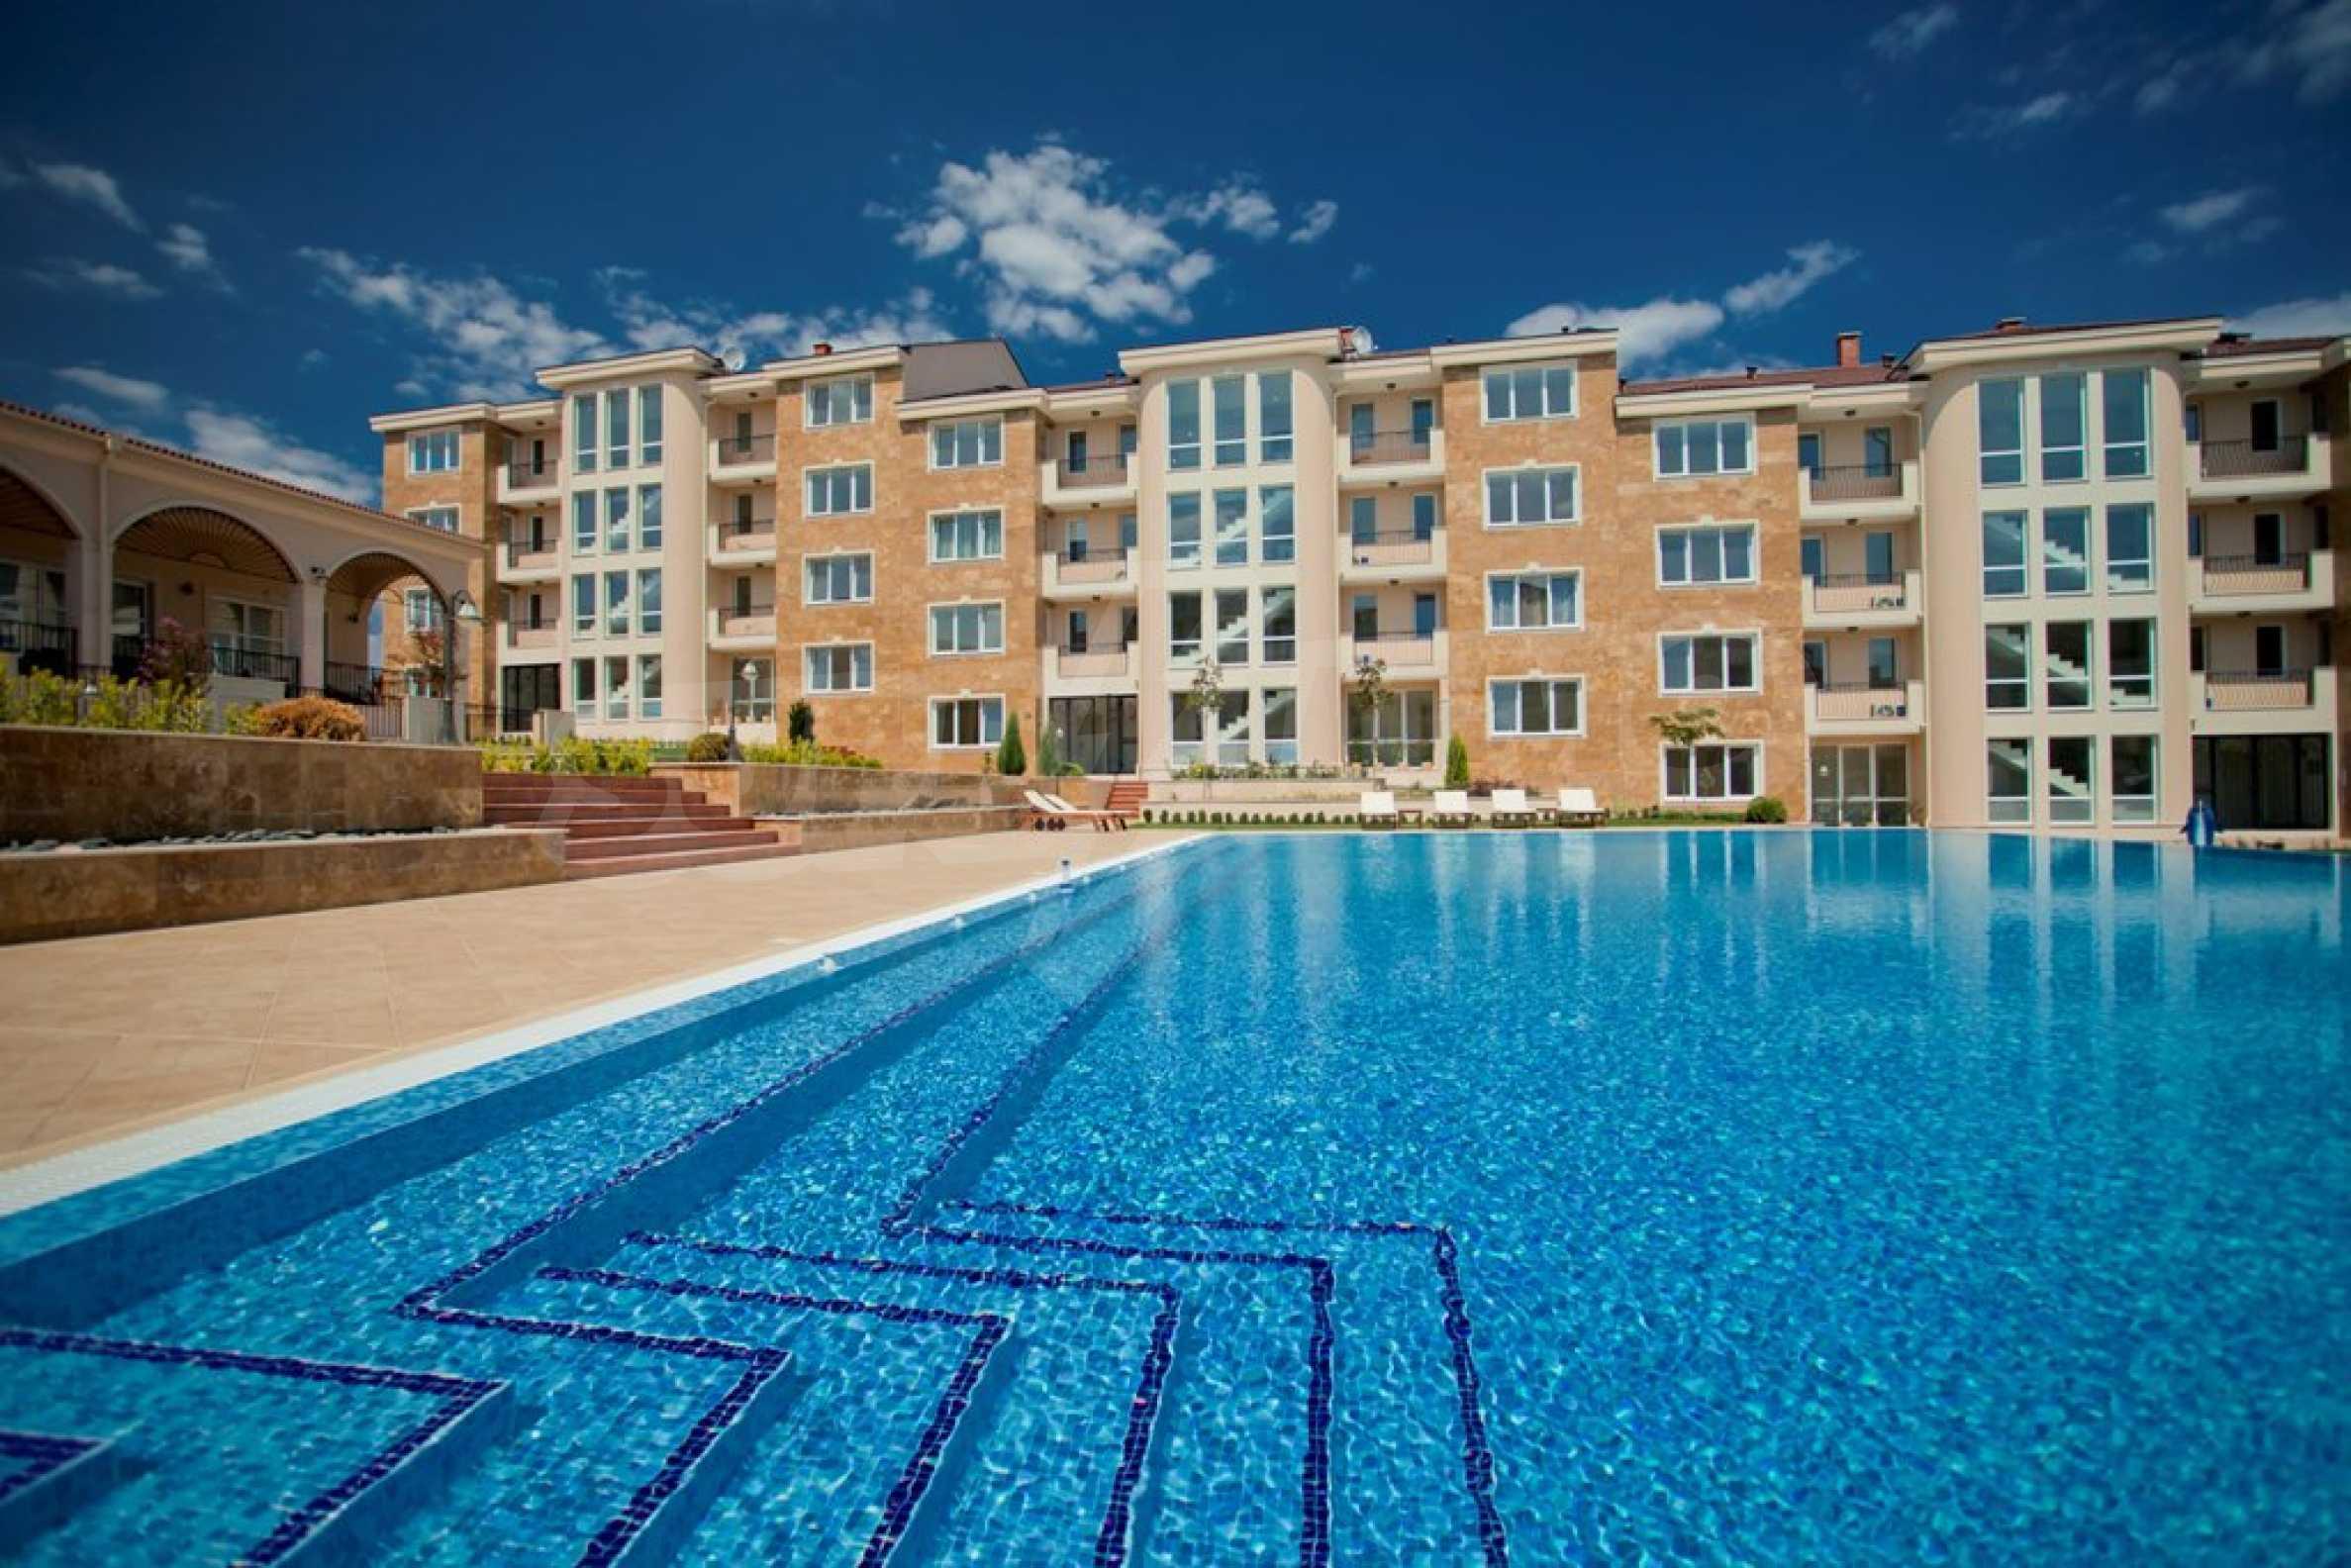 New apartment complex Atia resort in Chernomorets 6